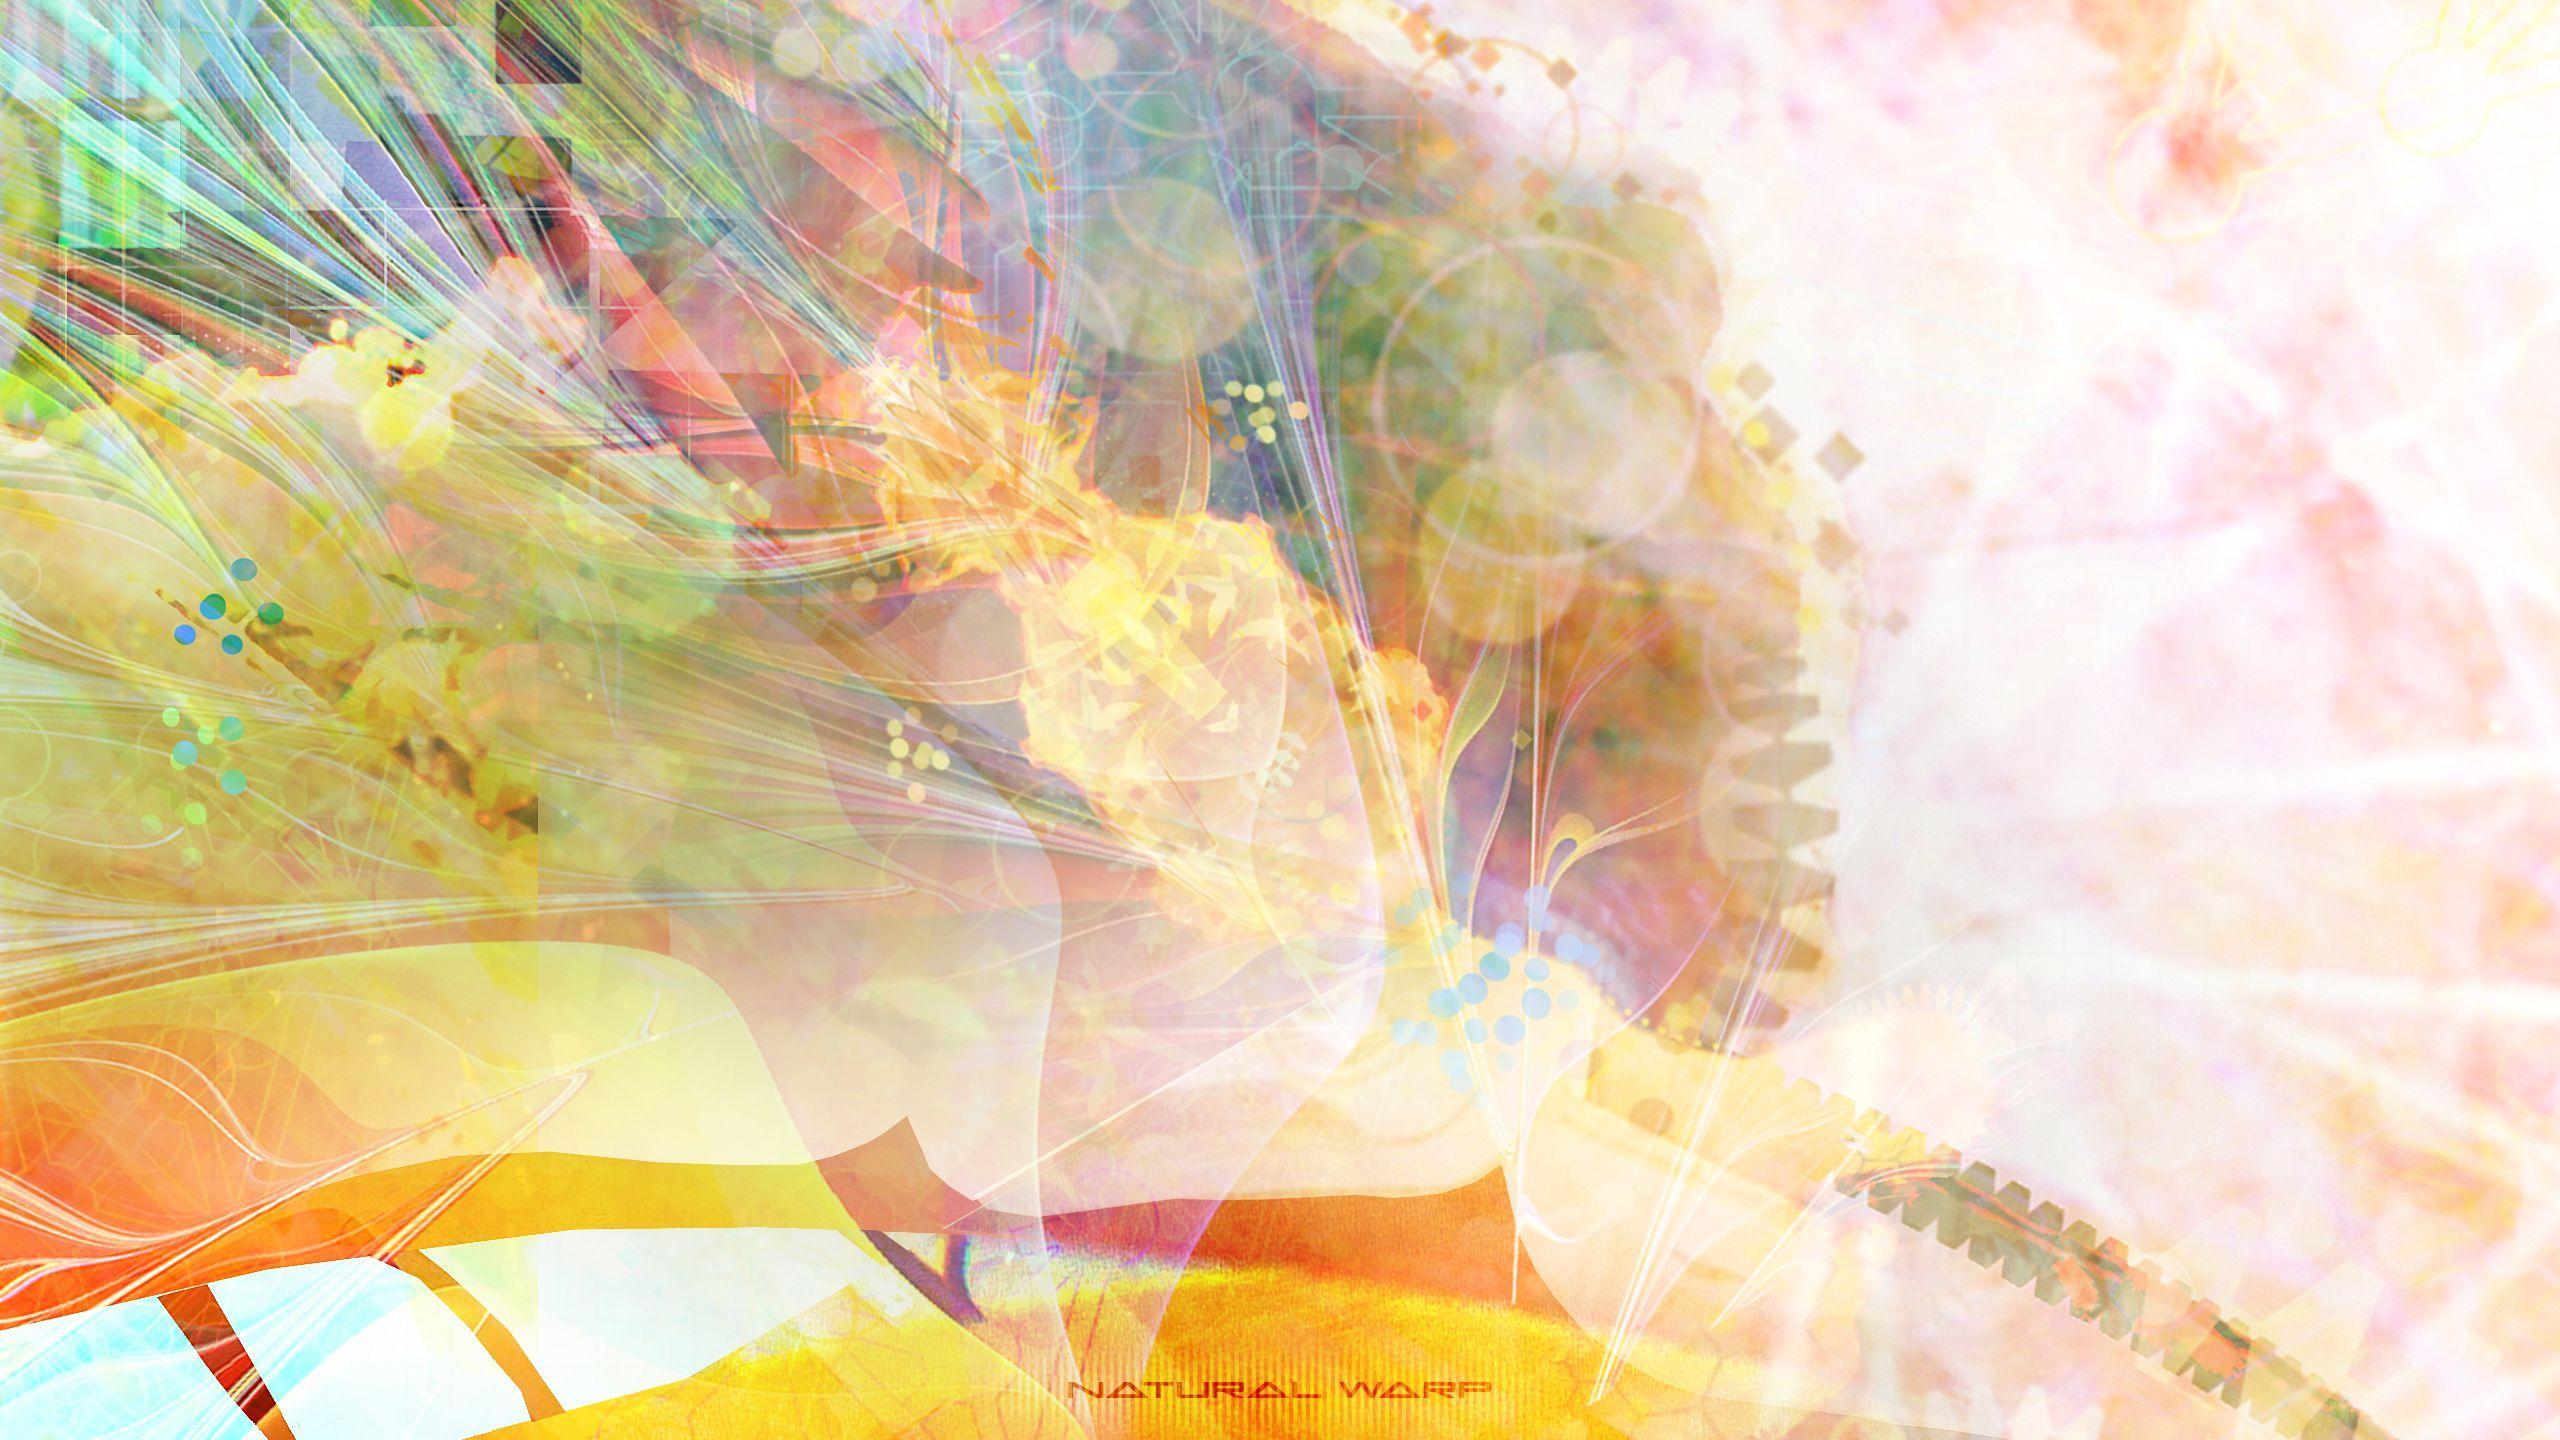 Natural Warp is creating Psychedelic Art   Patreon #patreon @patreon ...